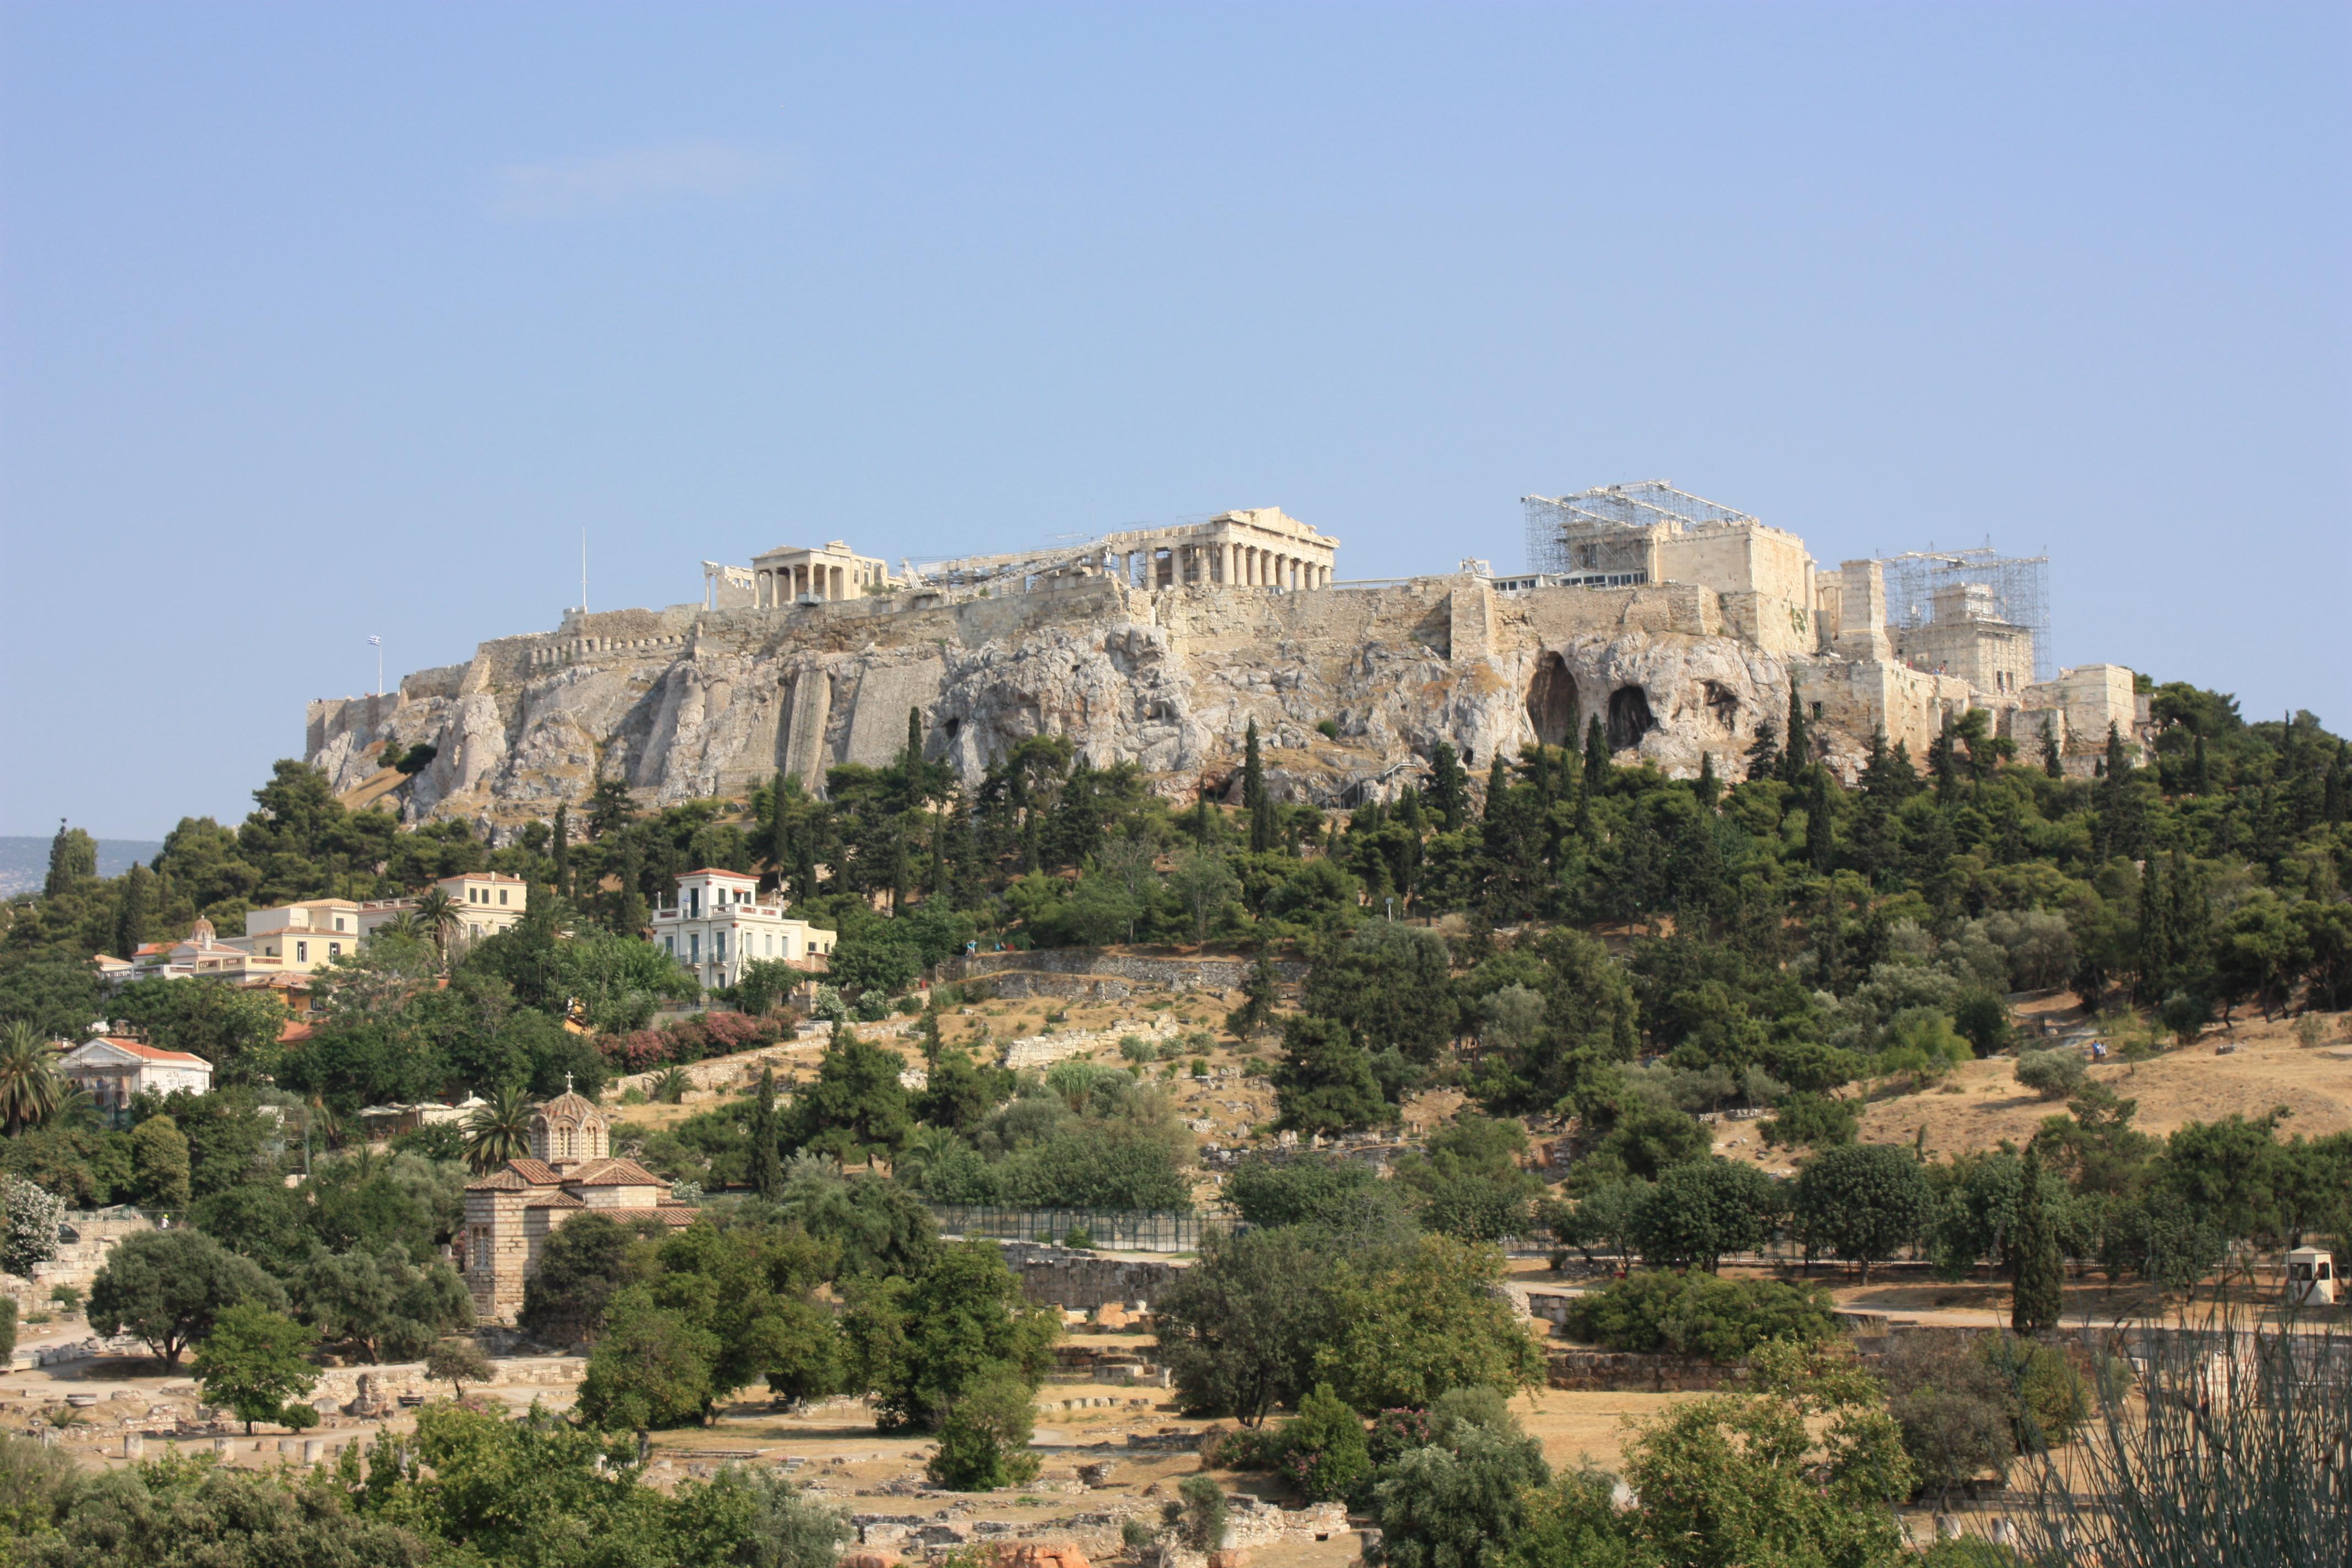 File:Athens, Acropolis (6244015433).jpg